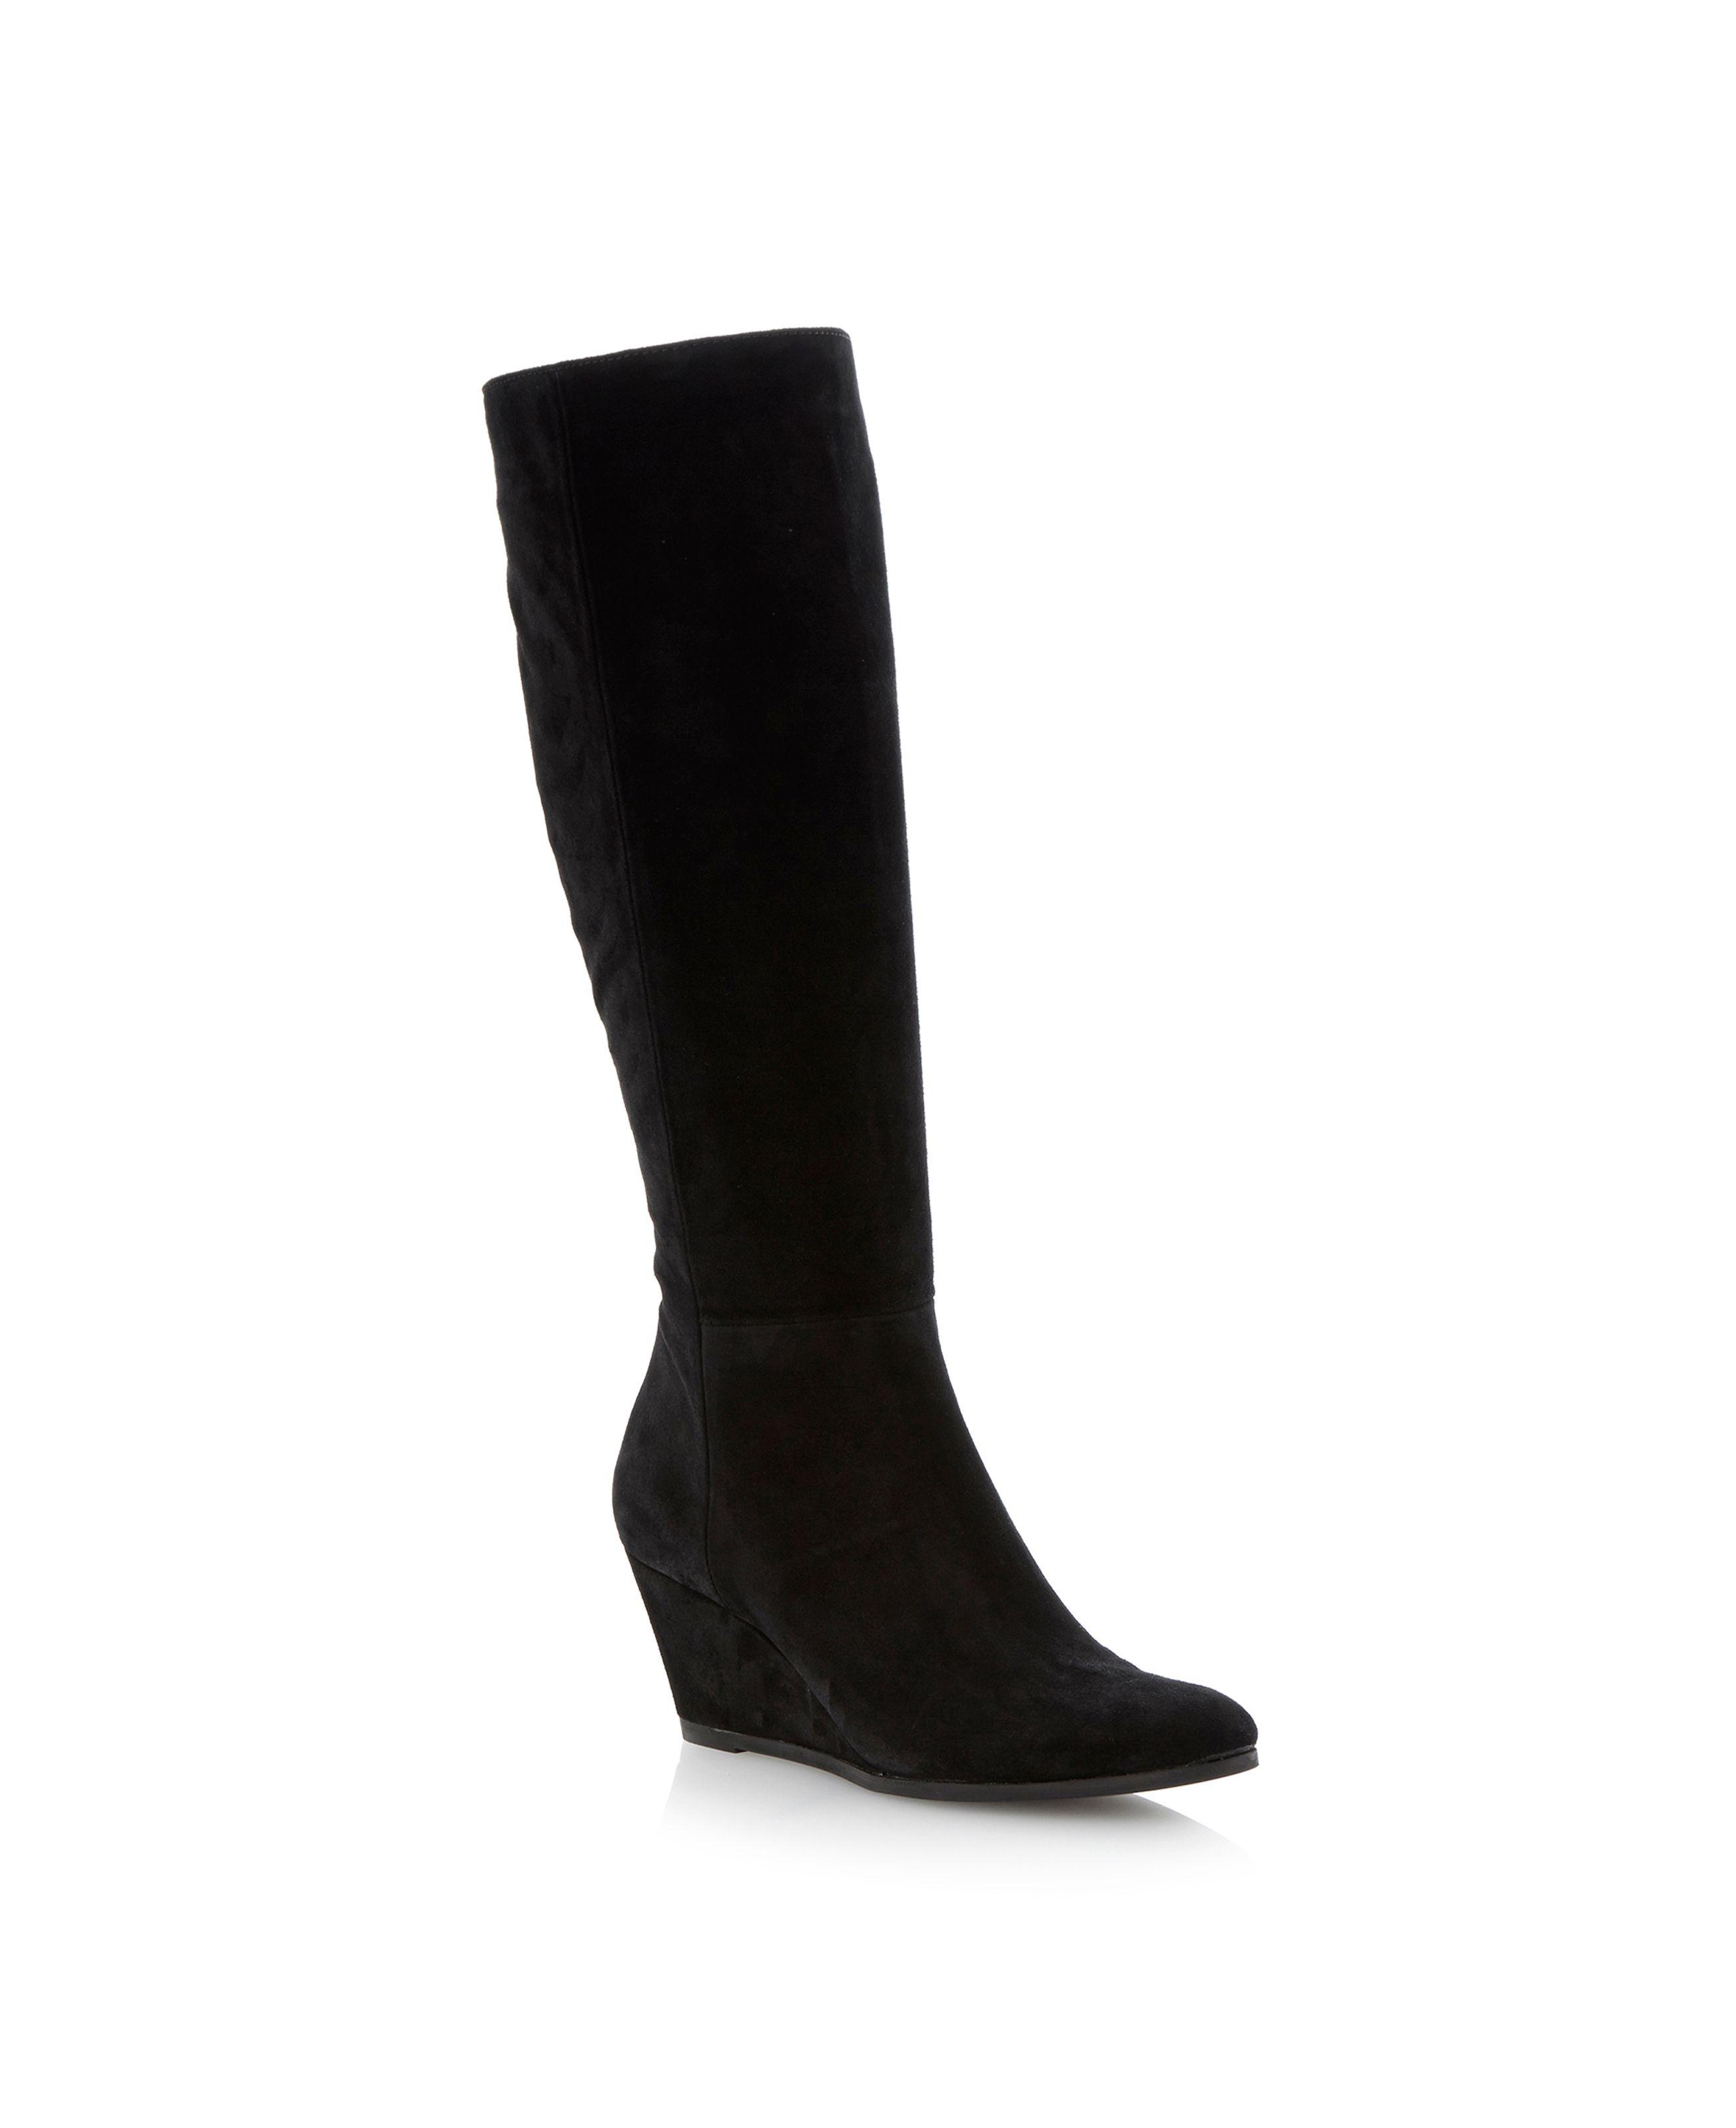 episode sansa high leg wedge boots in black black suede